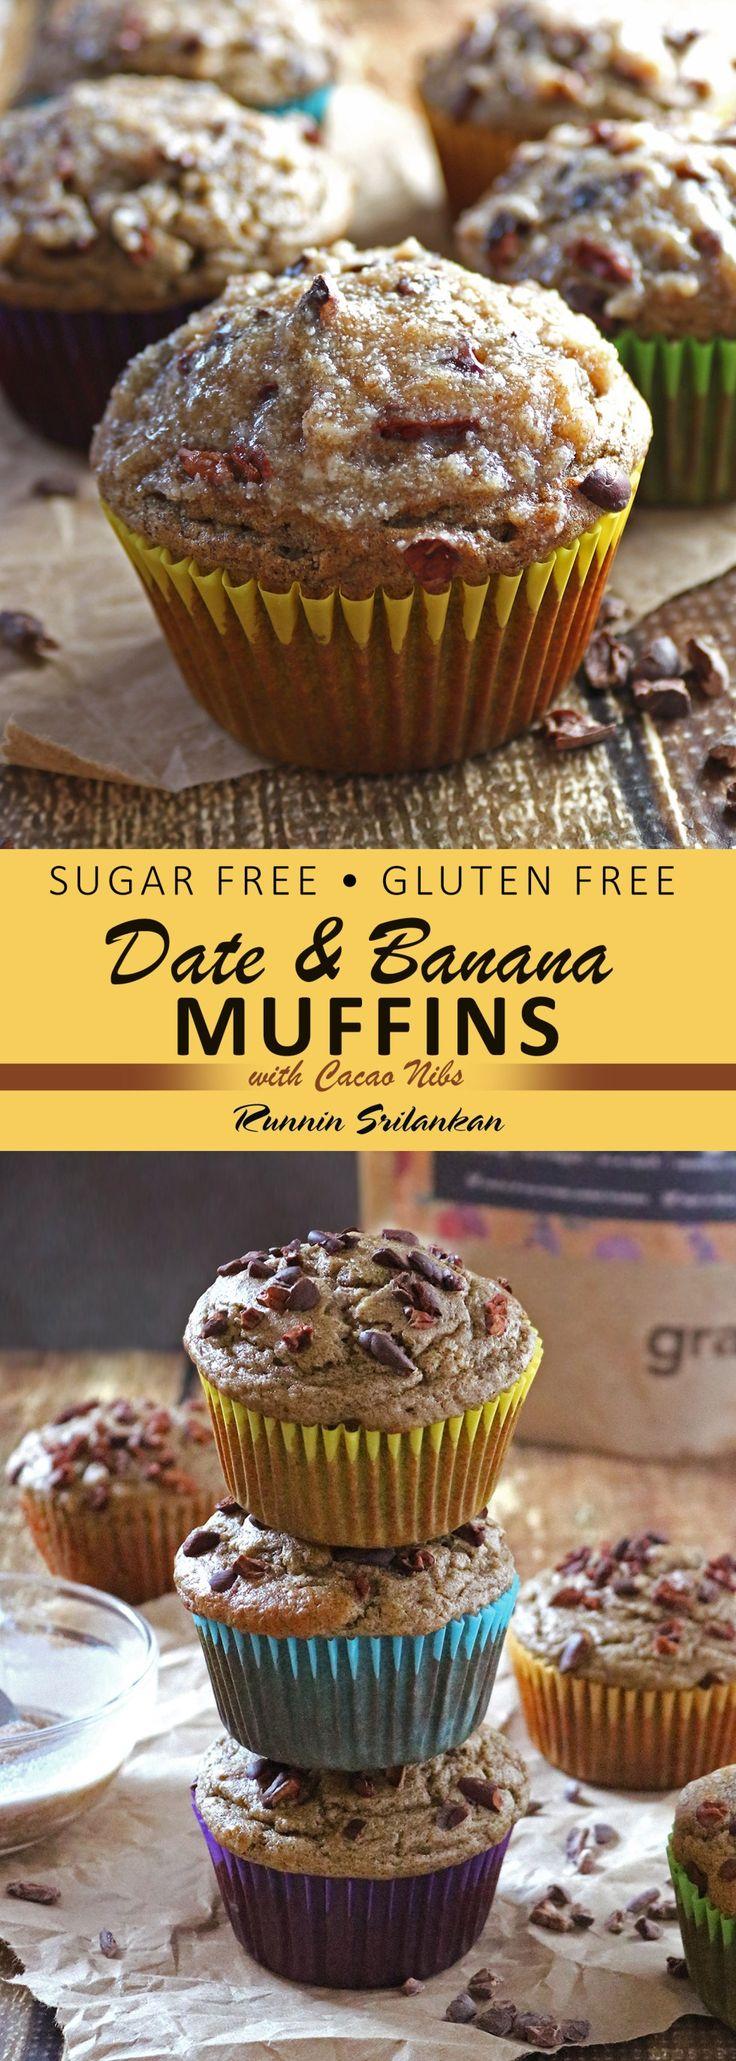 Banana Pudding clipart banana muffin Banana 1076 Date And with